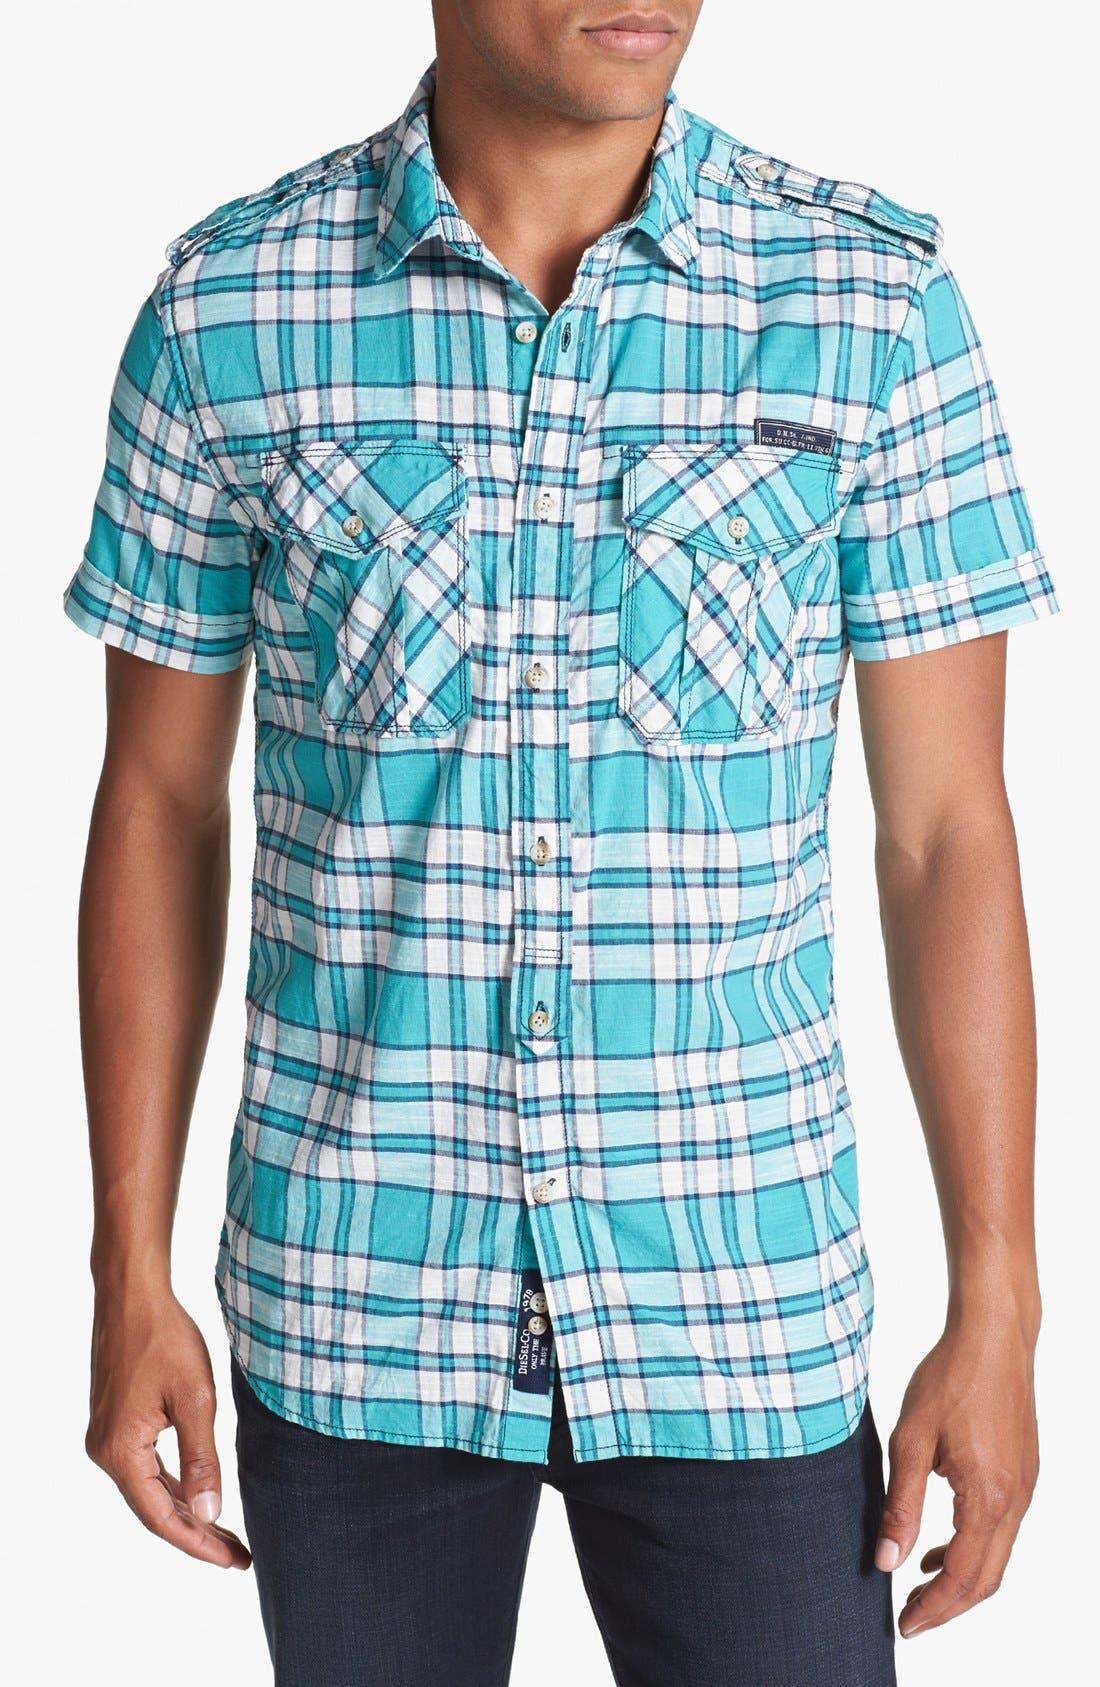 Alternate Image 1 Selected - DIESEL® 'Sadela' Yarn Dyed Check Woven Shirt